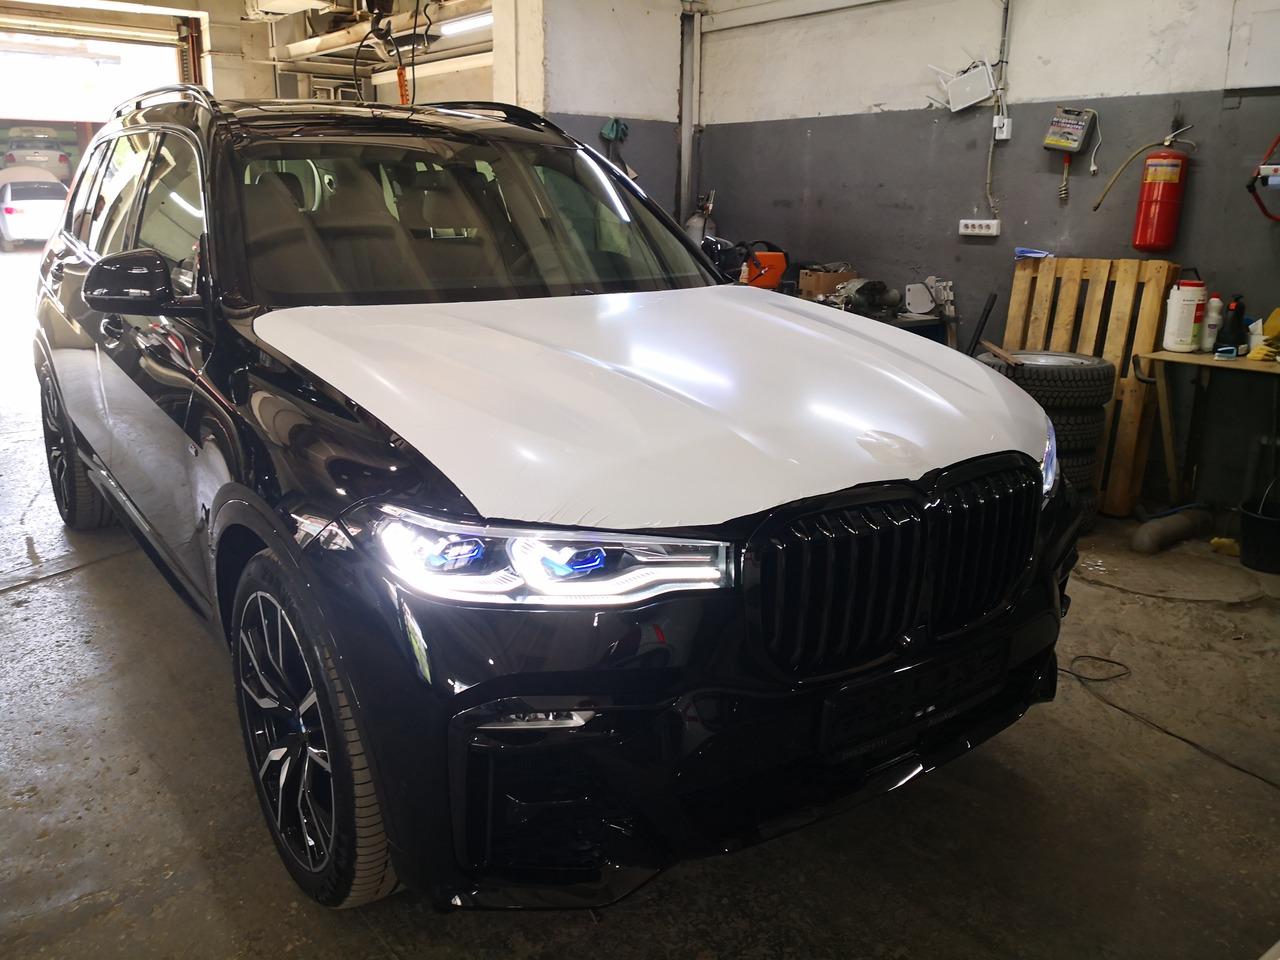 X7 G07 xDrive 30d 2021